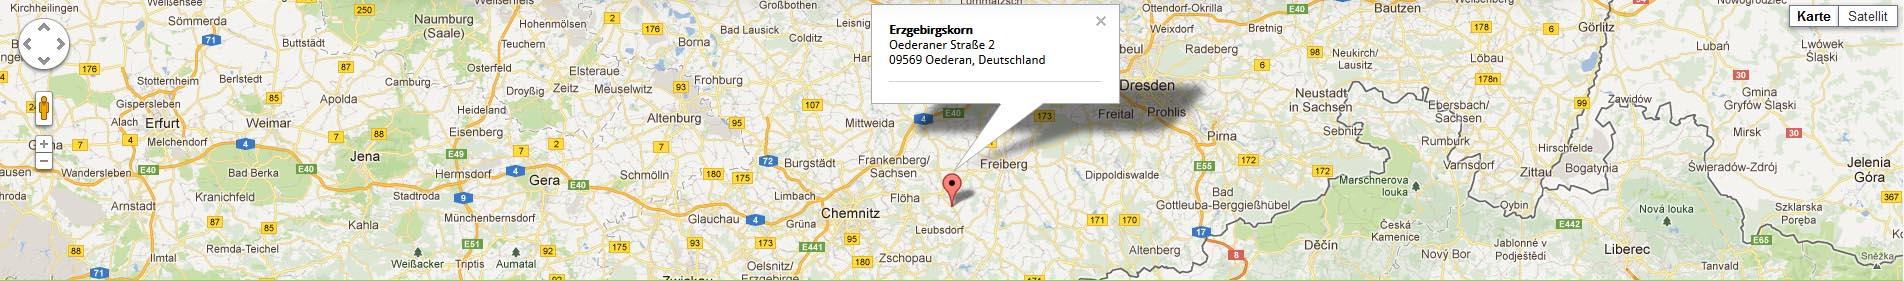 Google Maps Karte Erzgebirgskorn